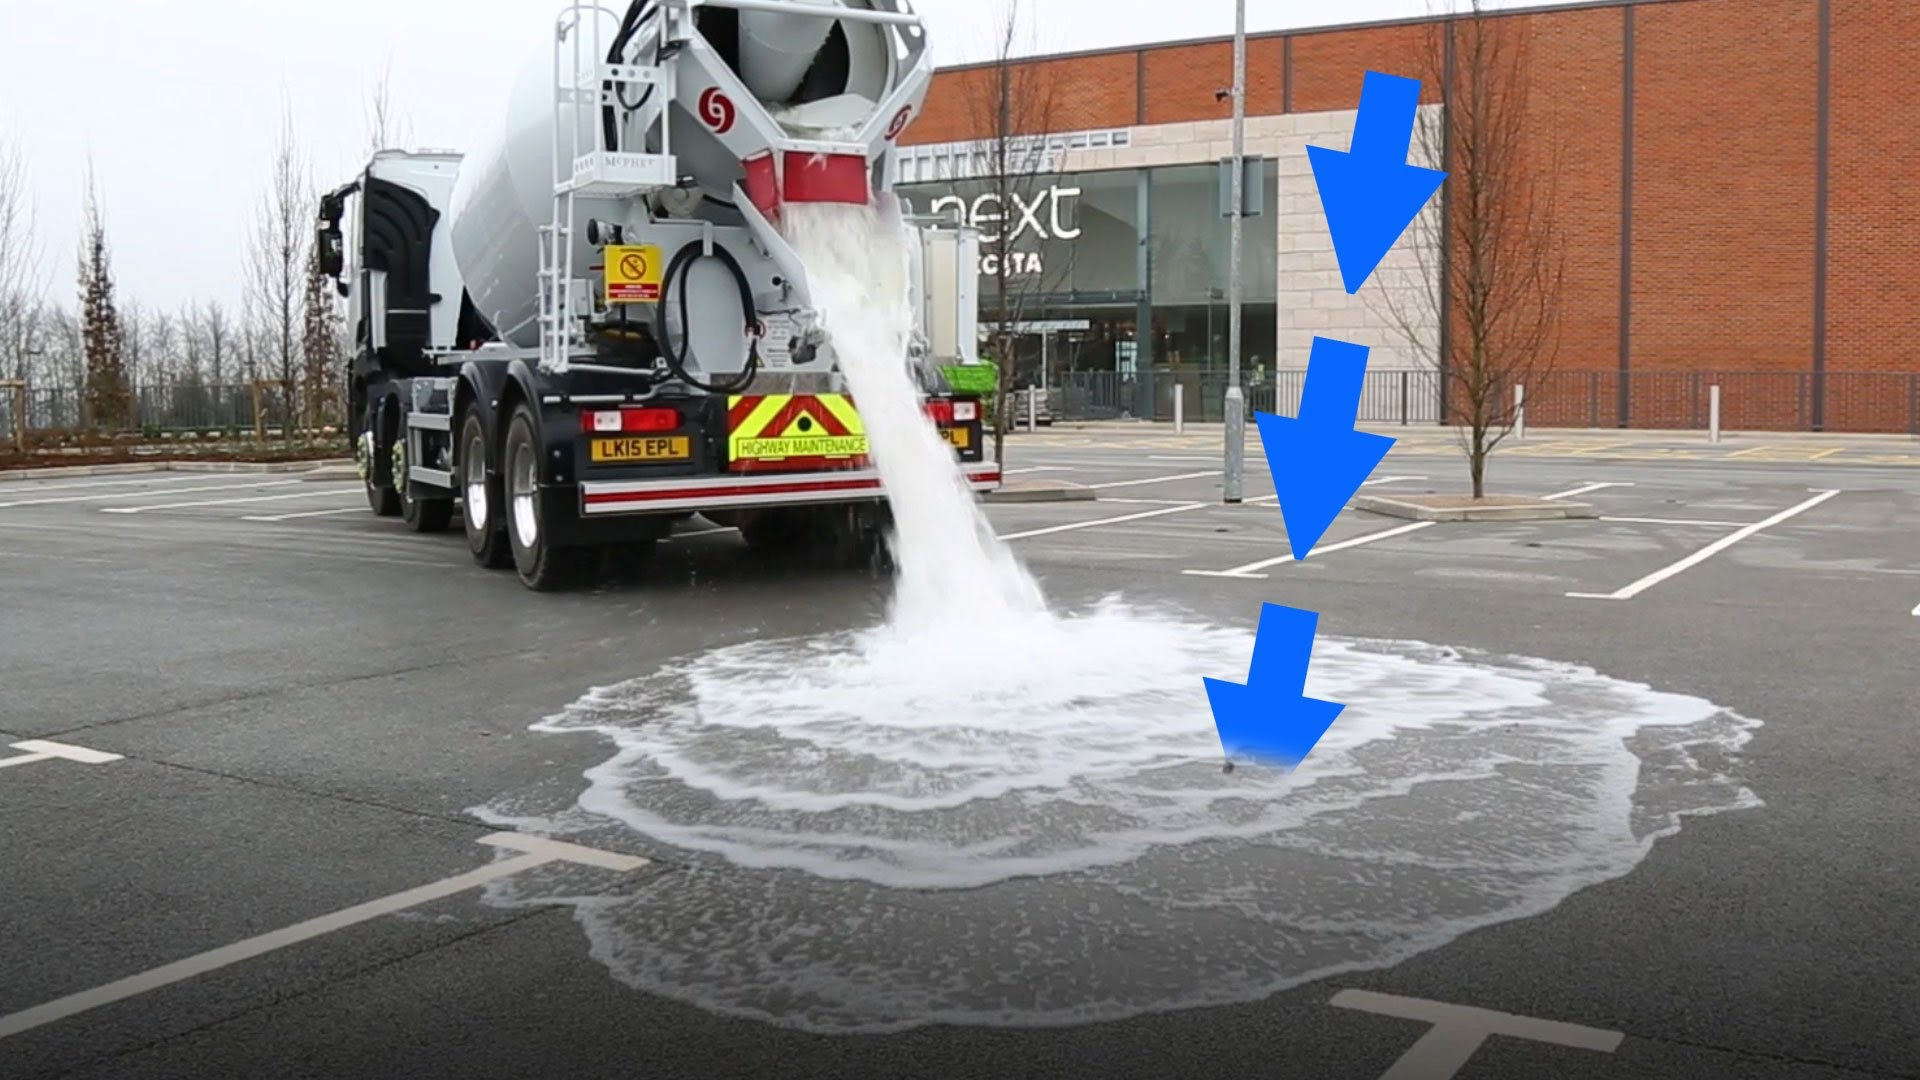 This Concrete/Asphalt Absorbs Water Like Magic